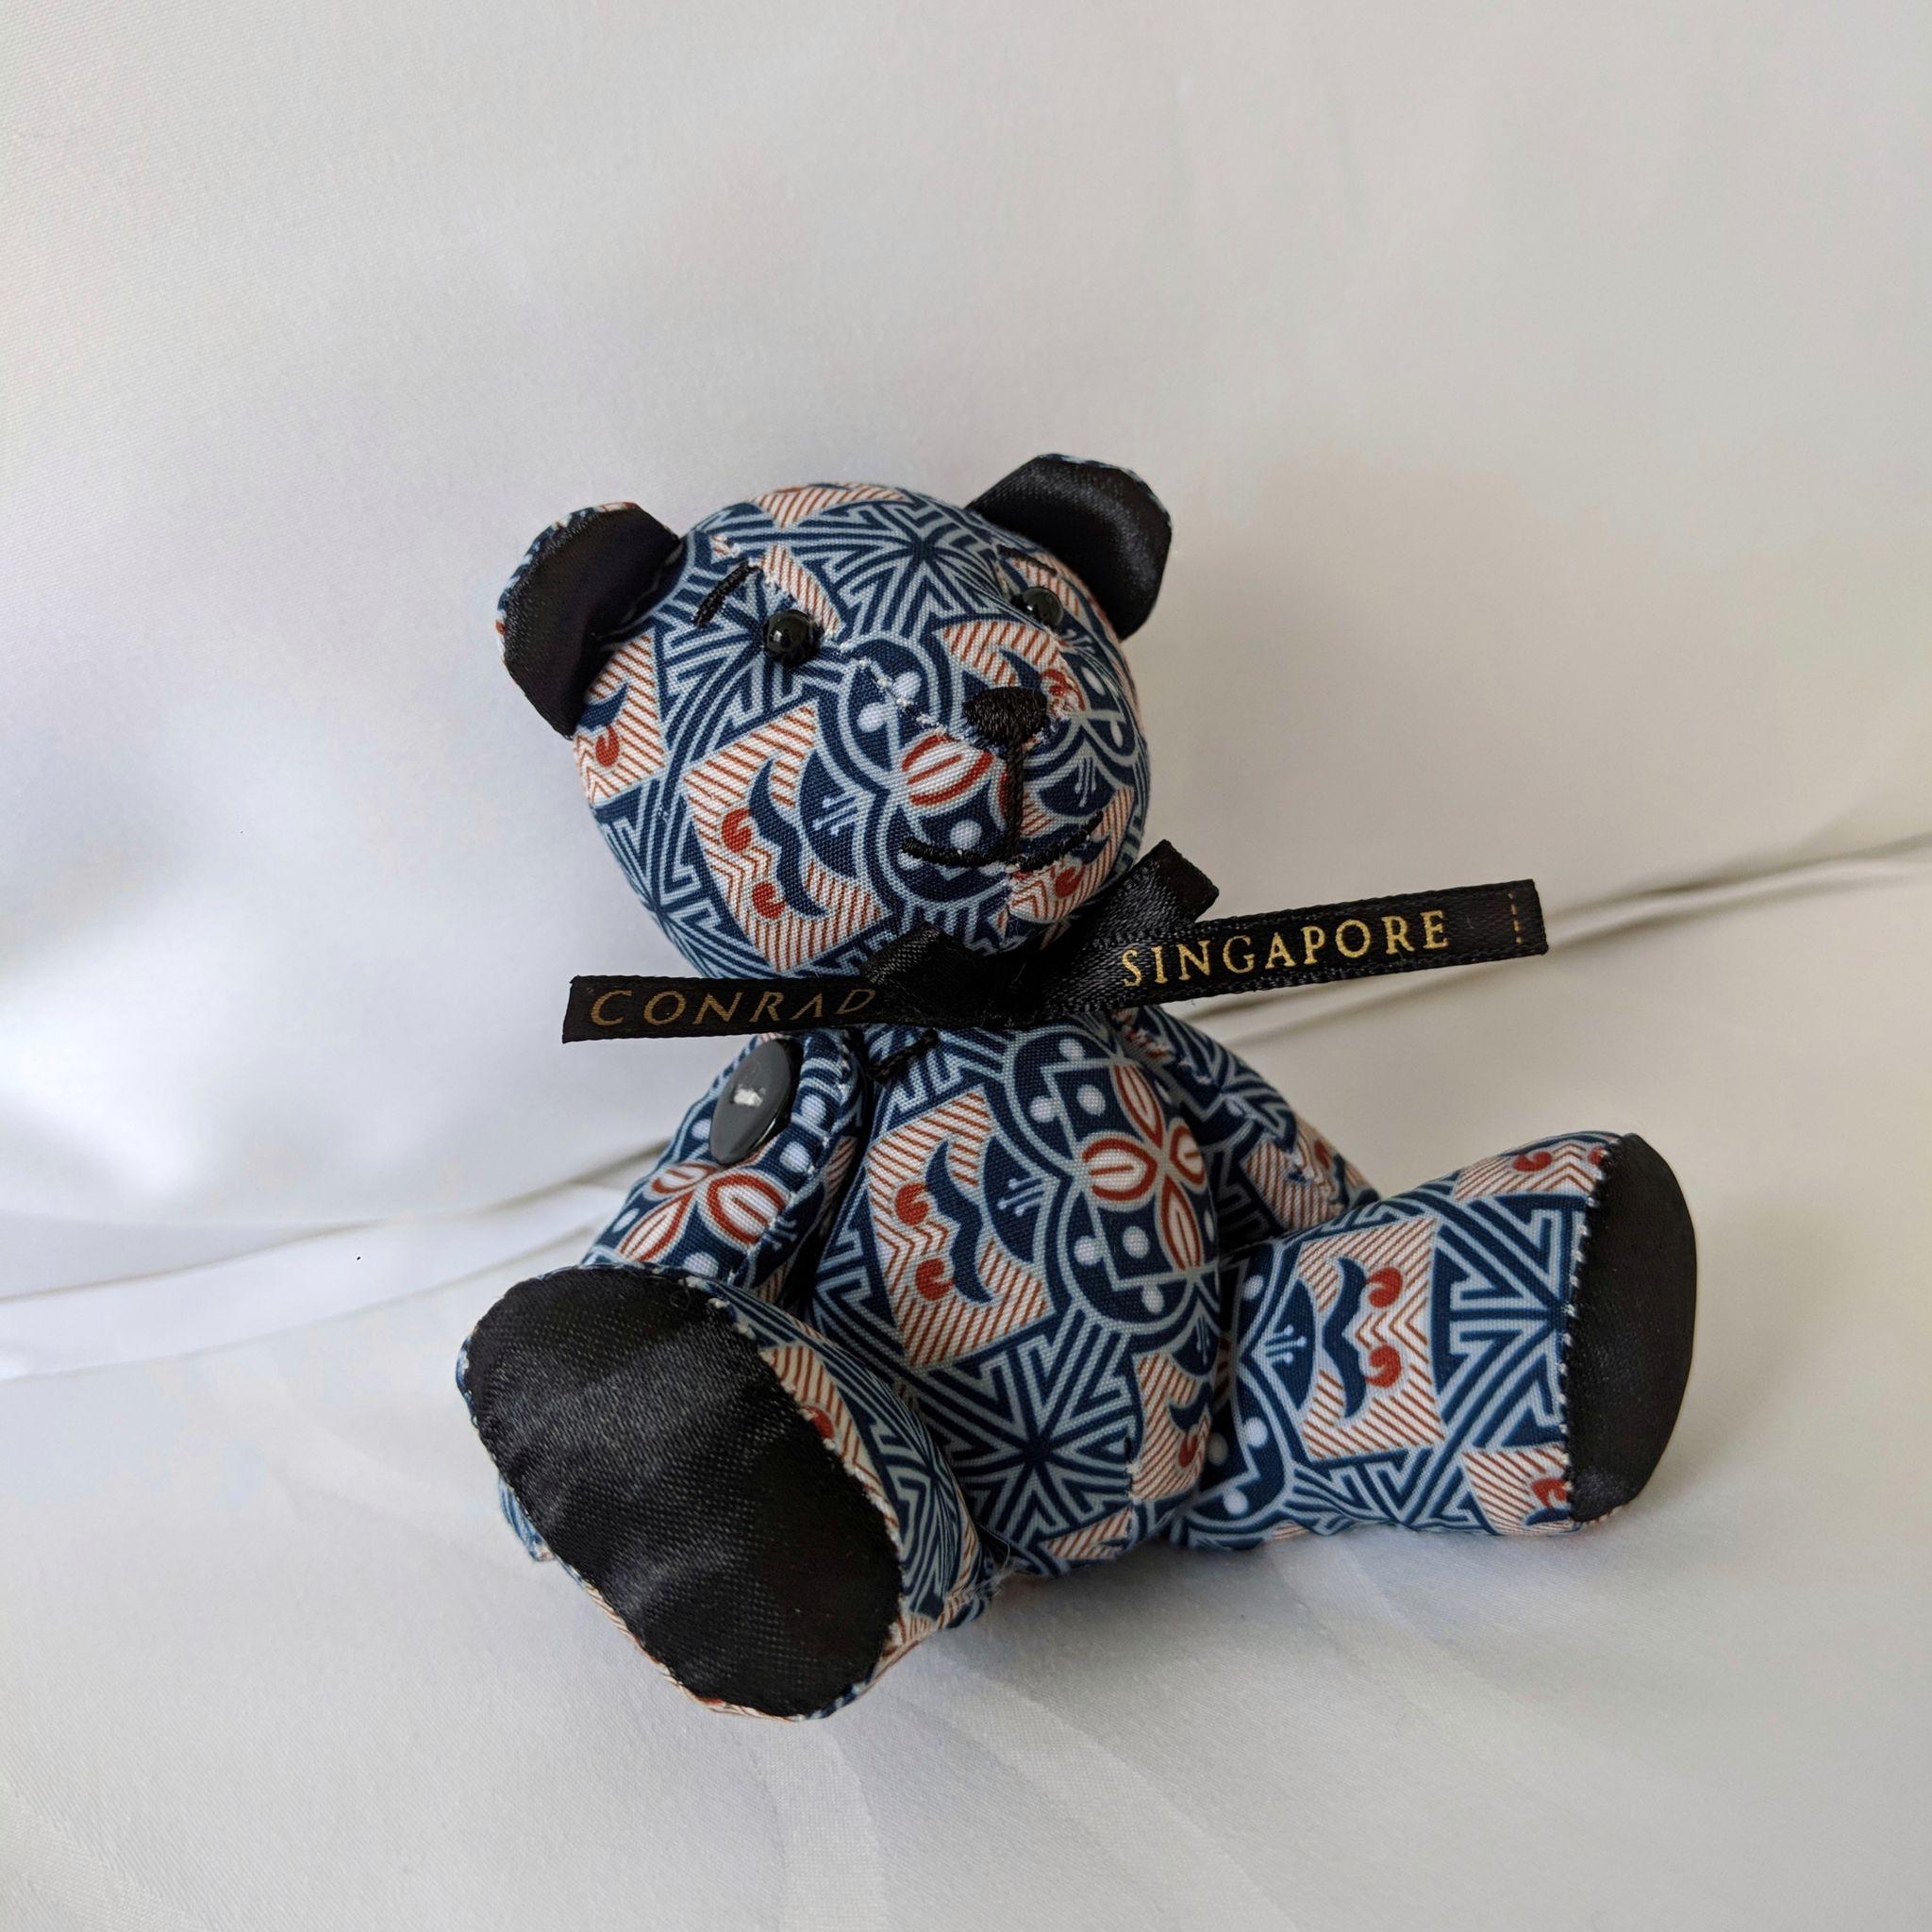 conrad centennial singapore mascot bear